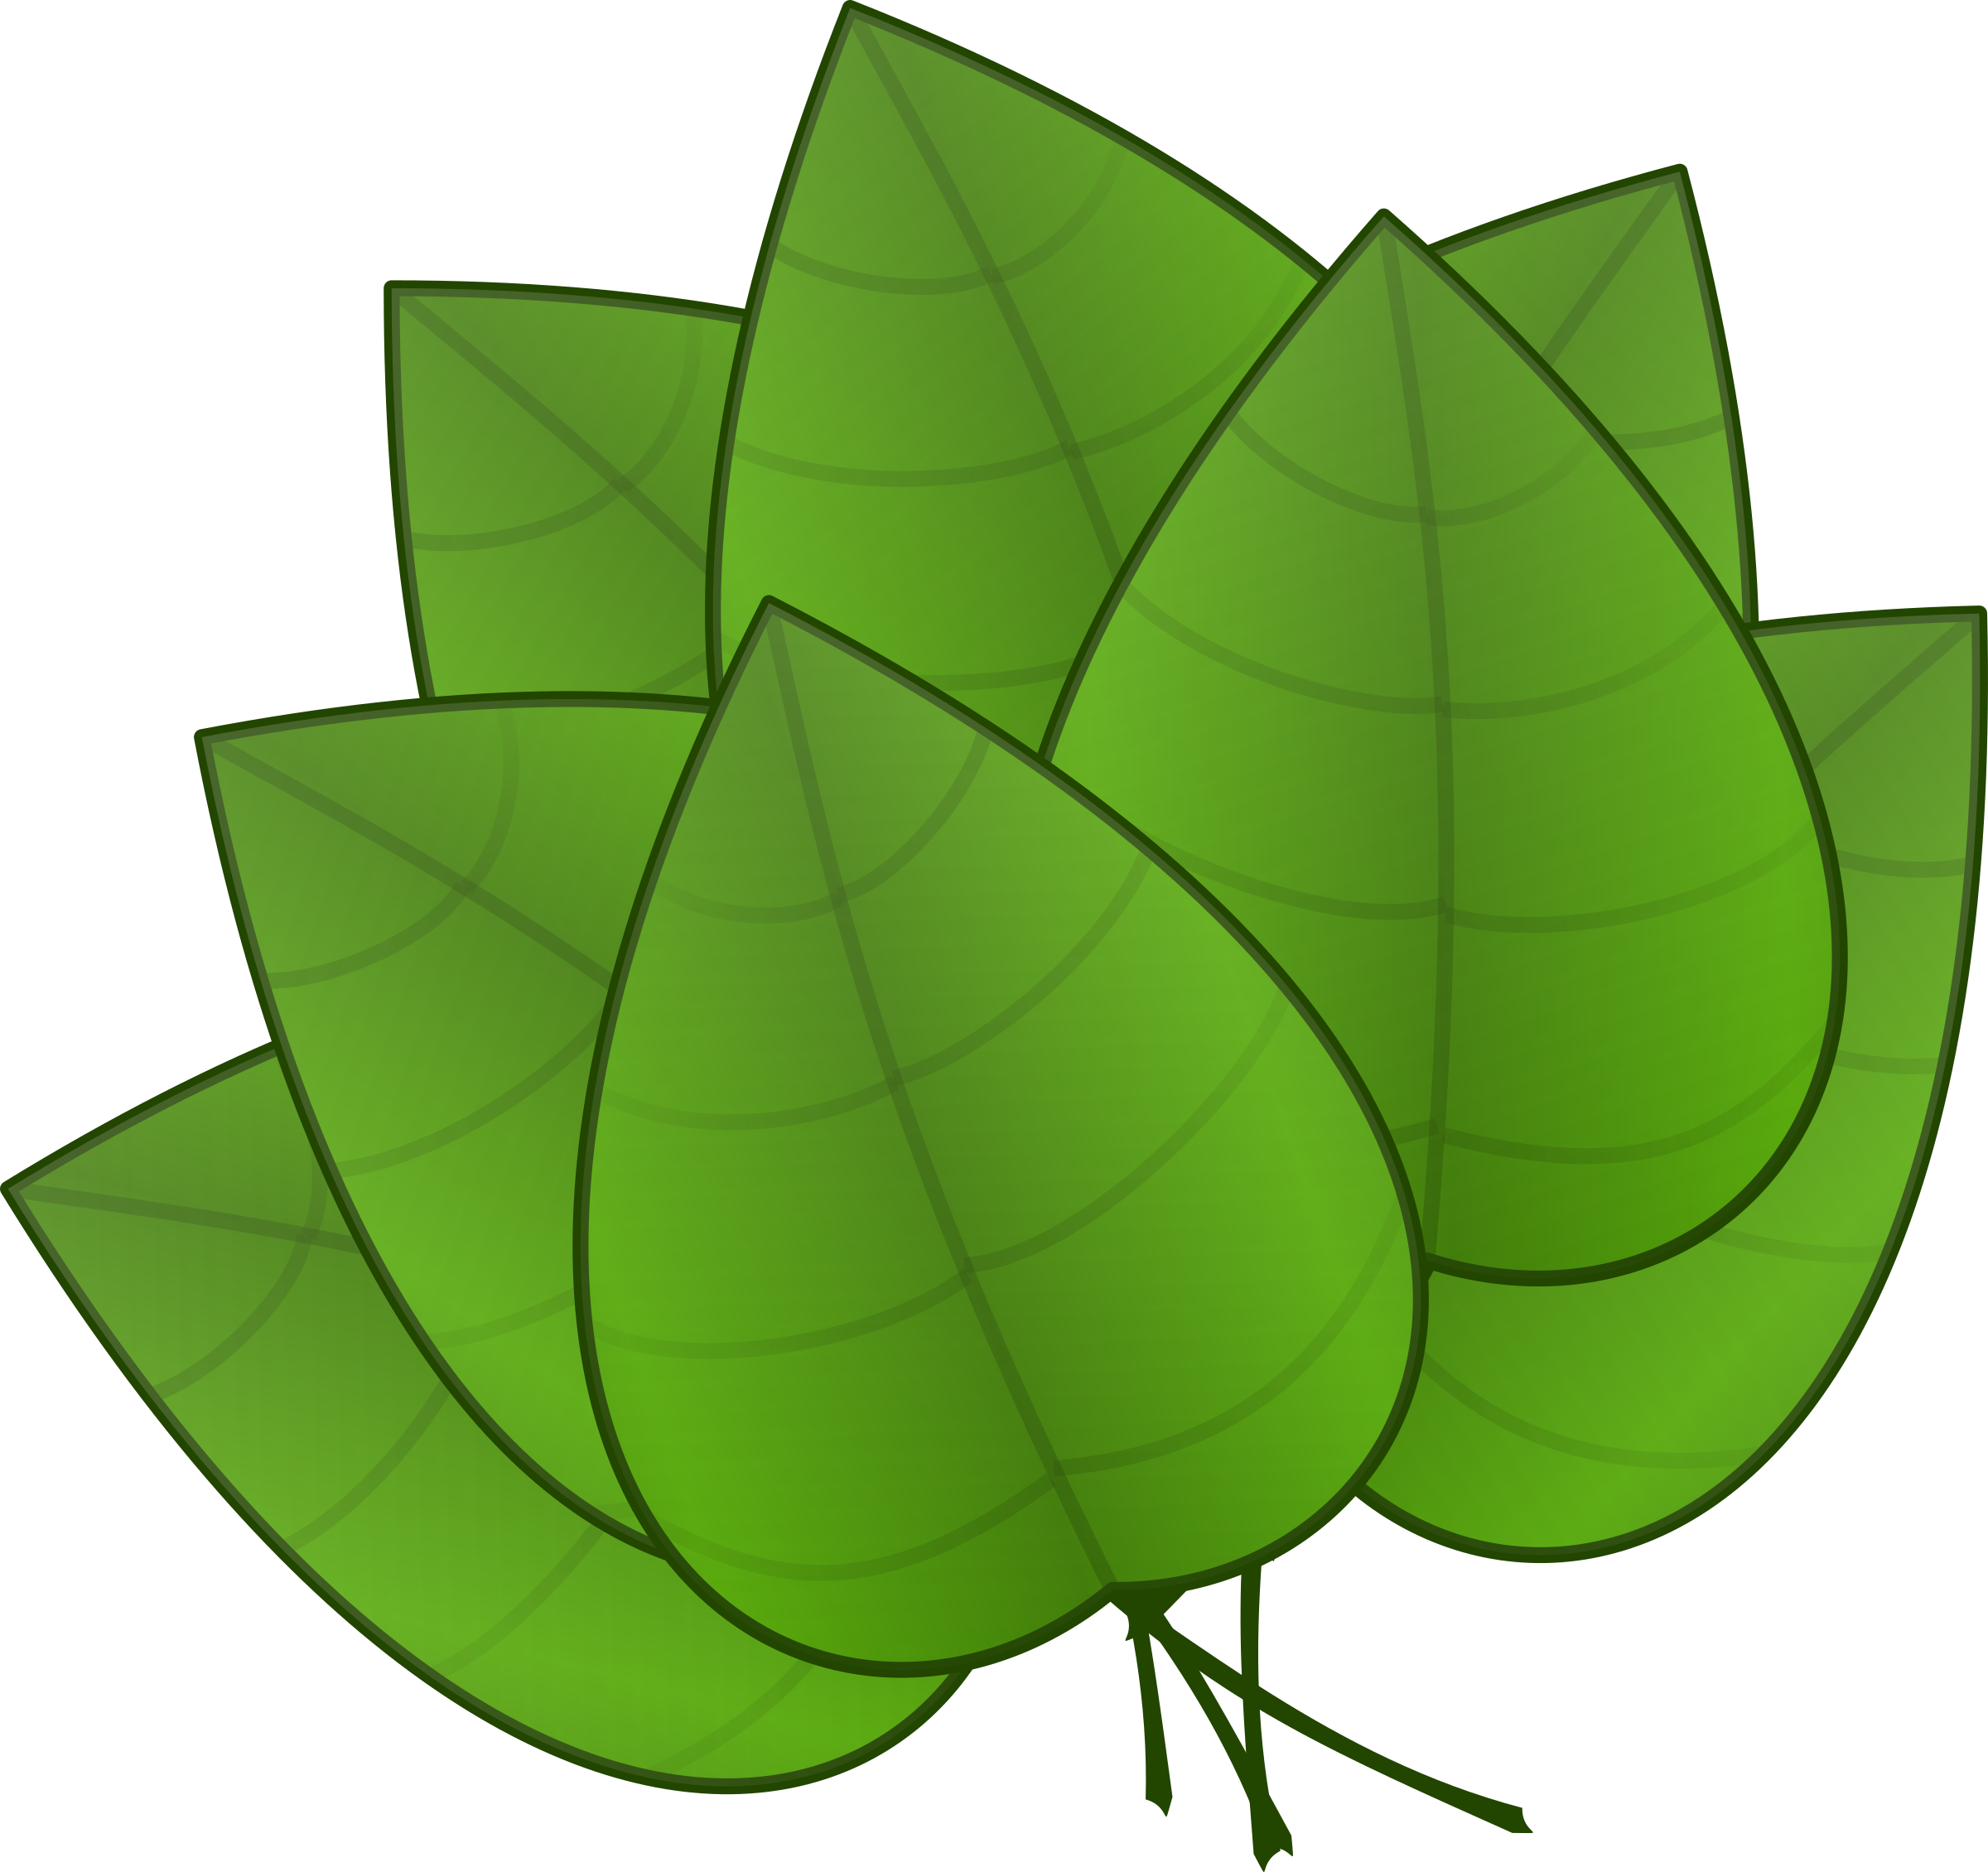 Leaves clipart big leaf Leaves Leaves Clipart